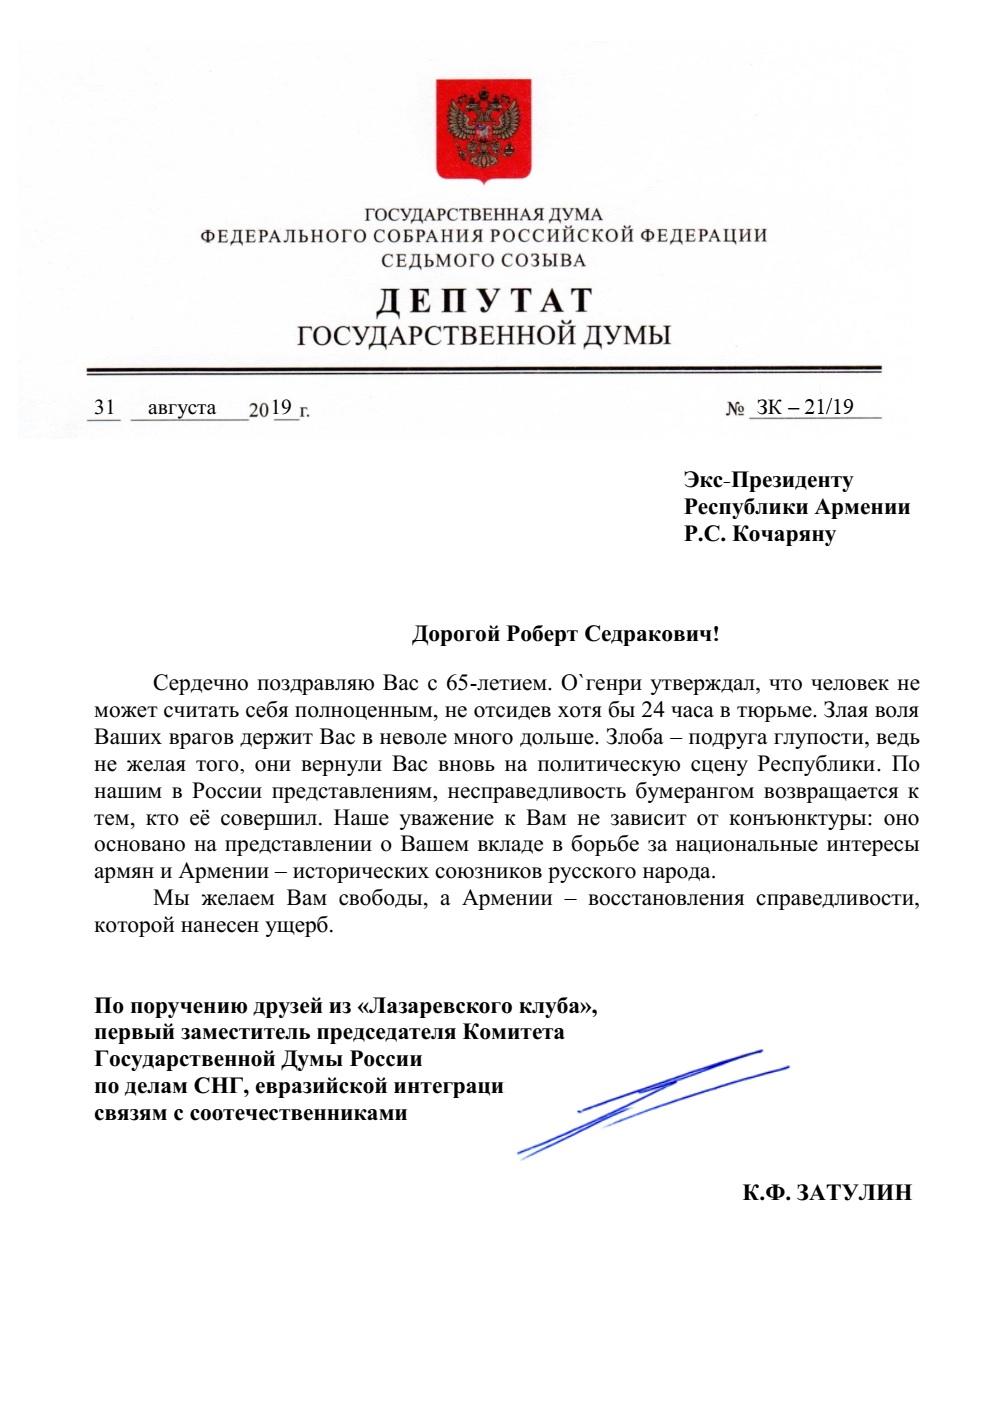 Кочаряну Р.С. от Затулина К.Ф